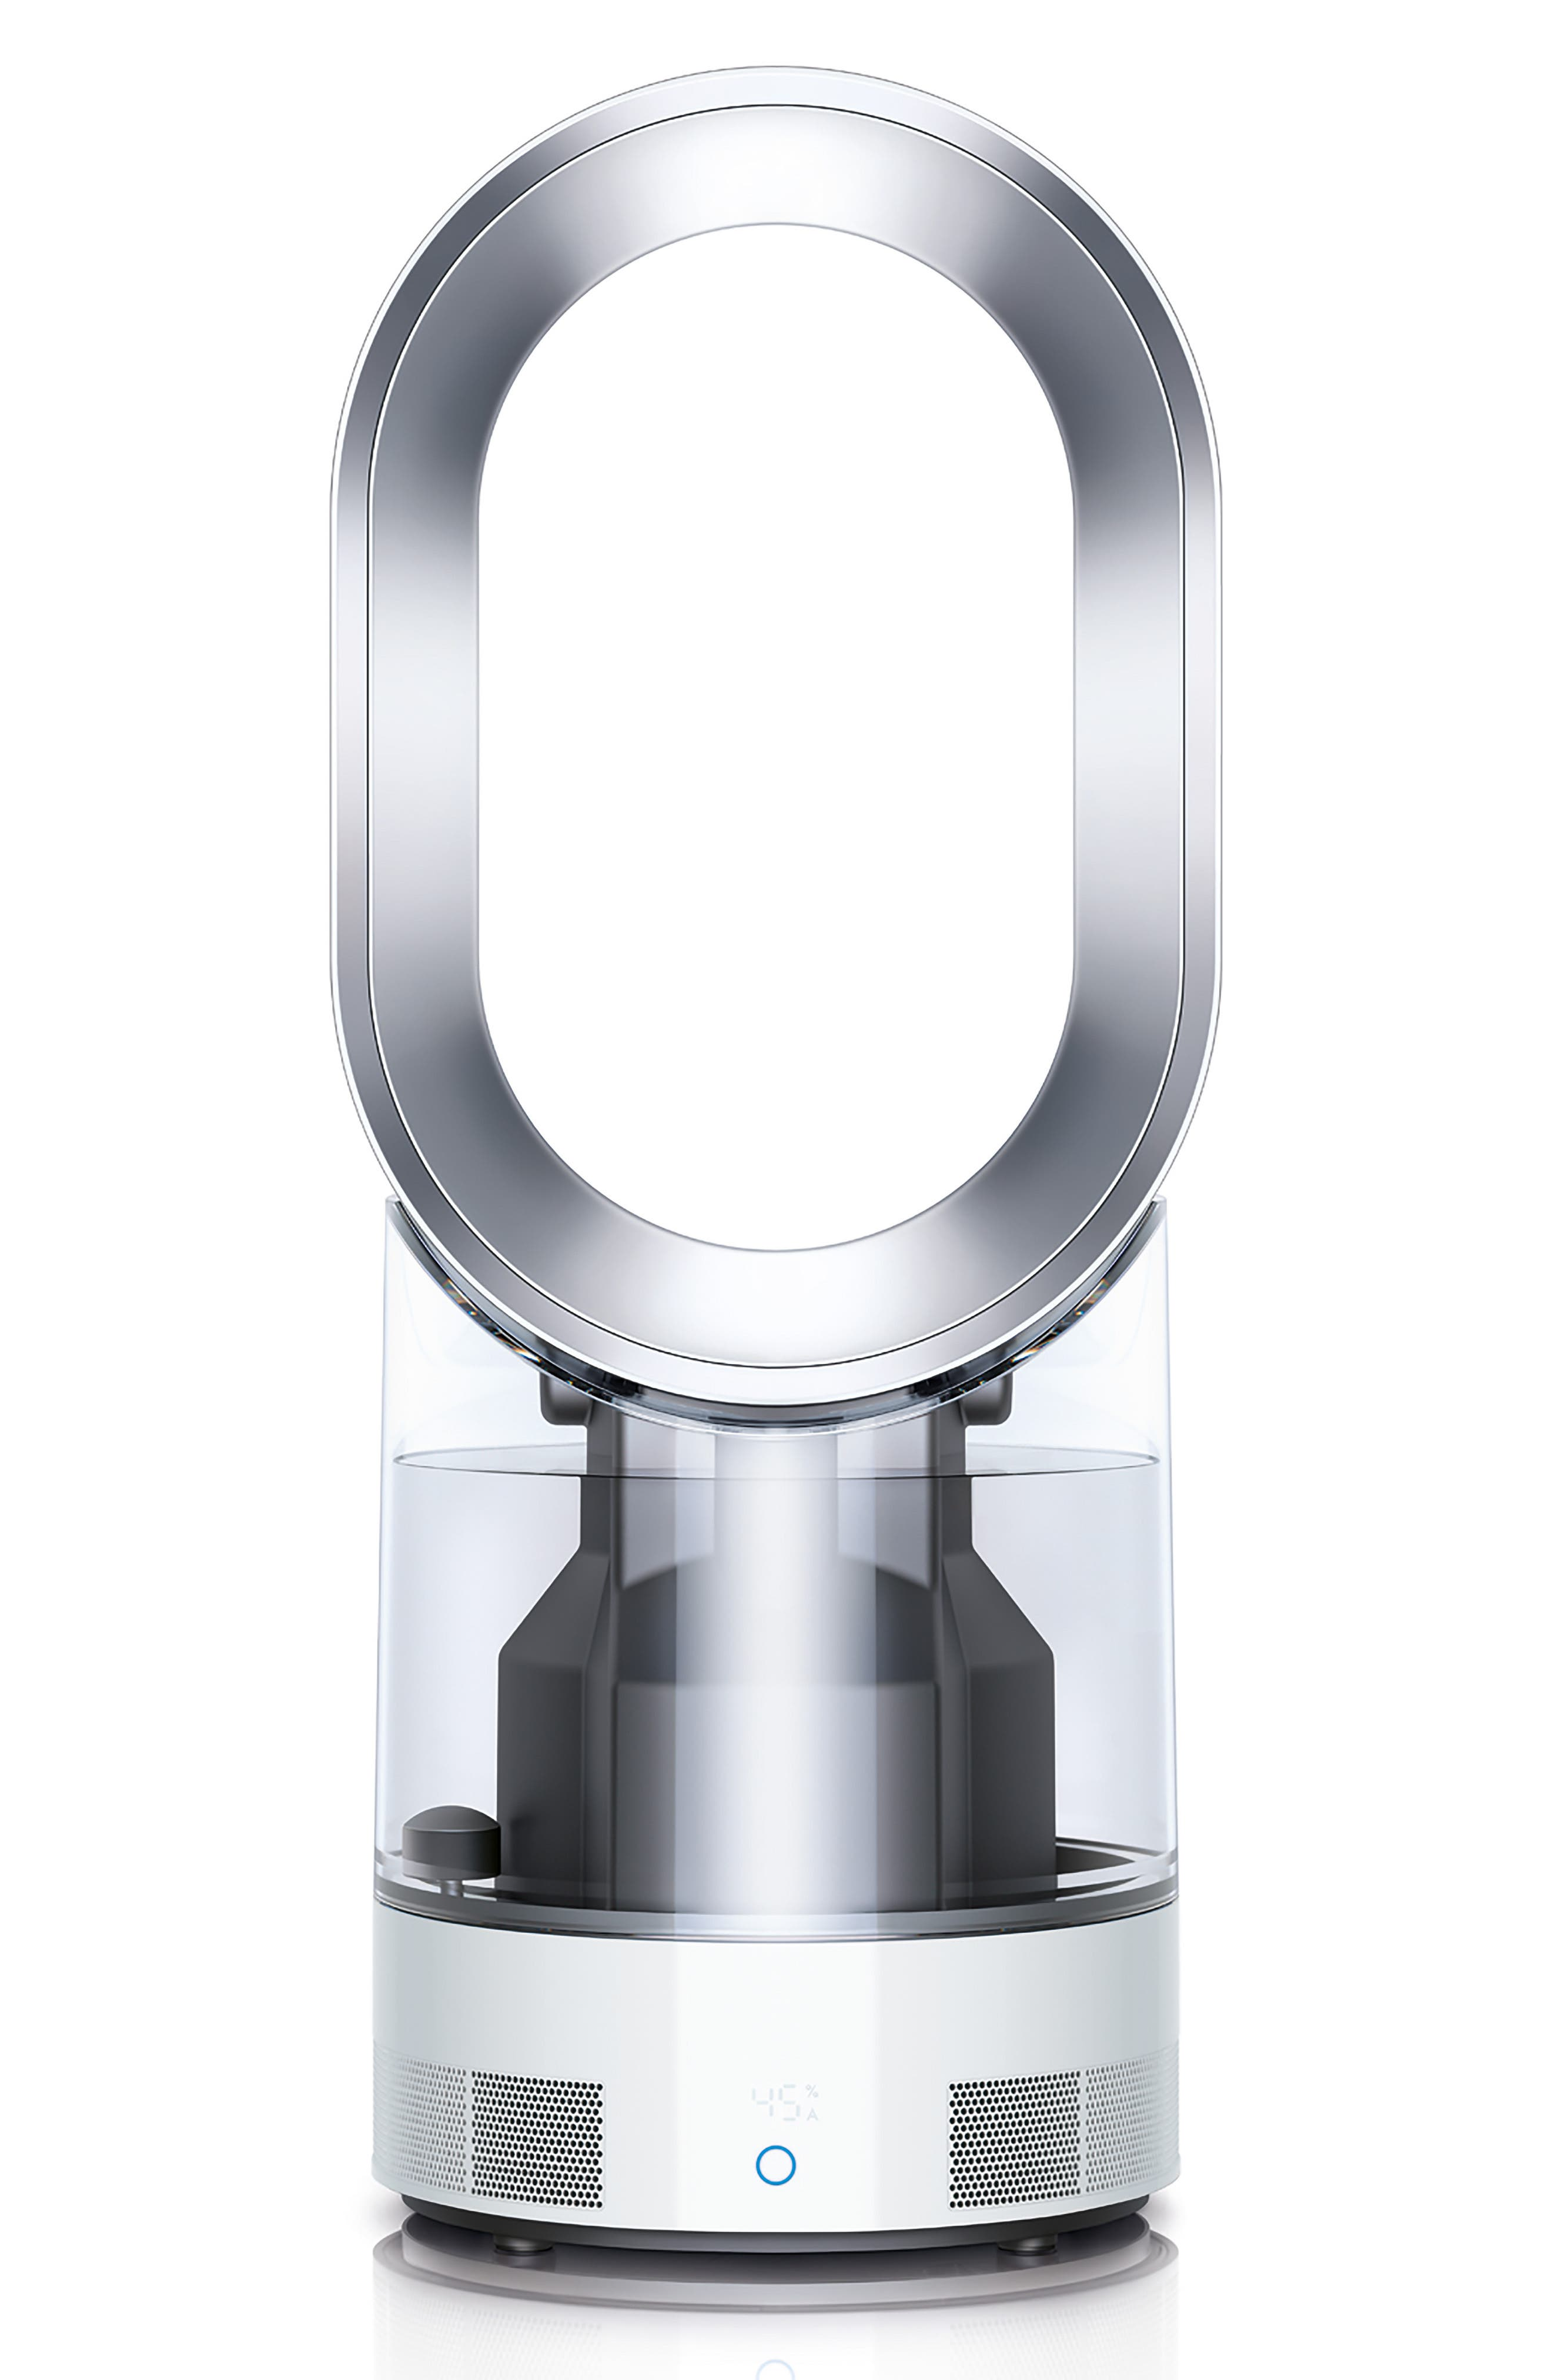 AM10 Hygienic Humidifier & Bladeless Fan,                             Main thumbnail 1, color,                             White/ Silver